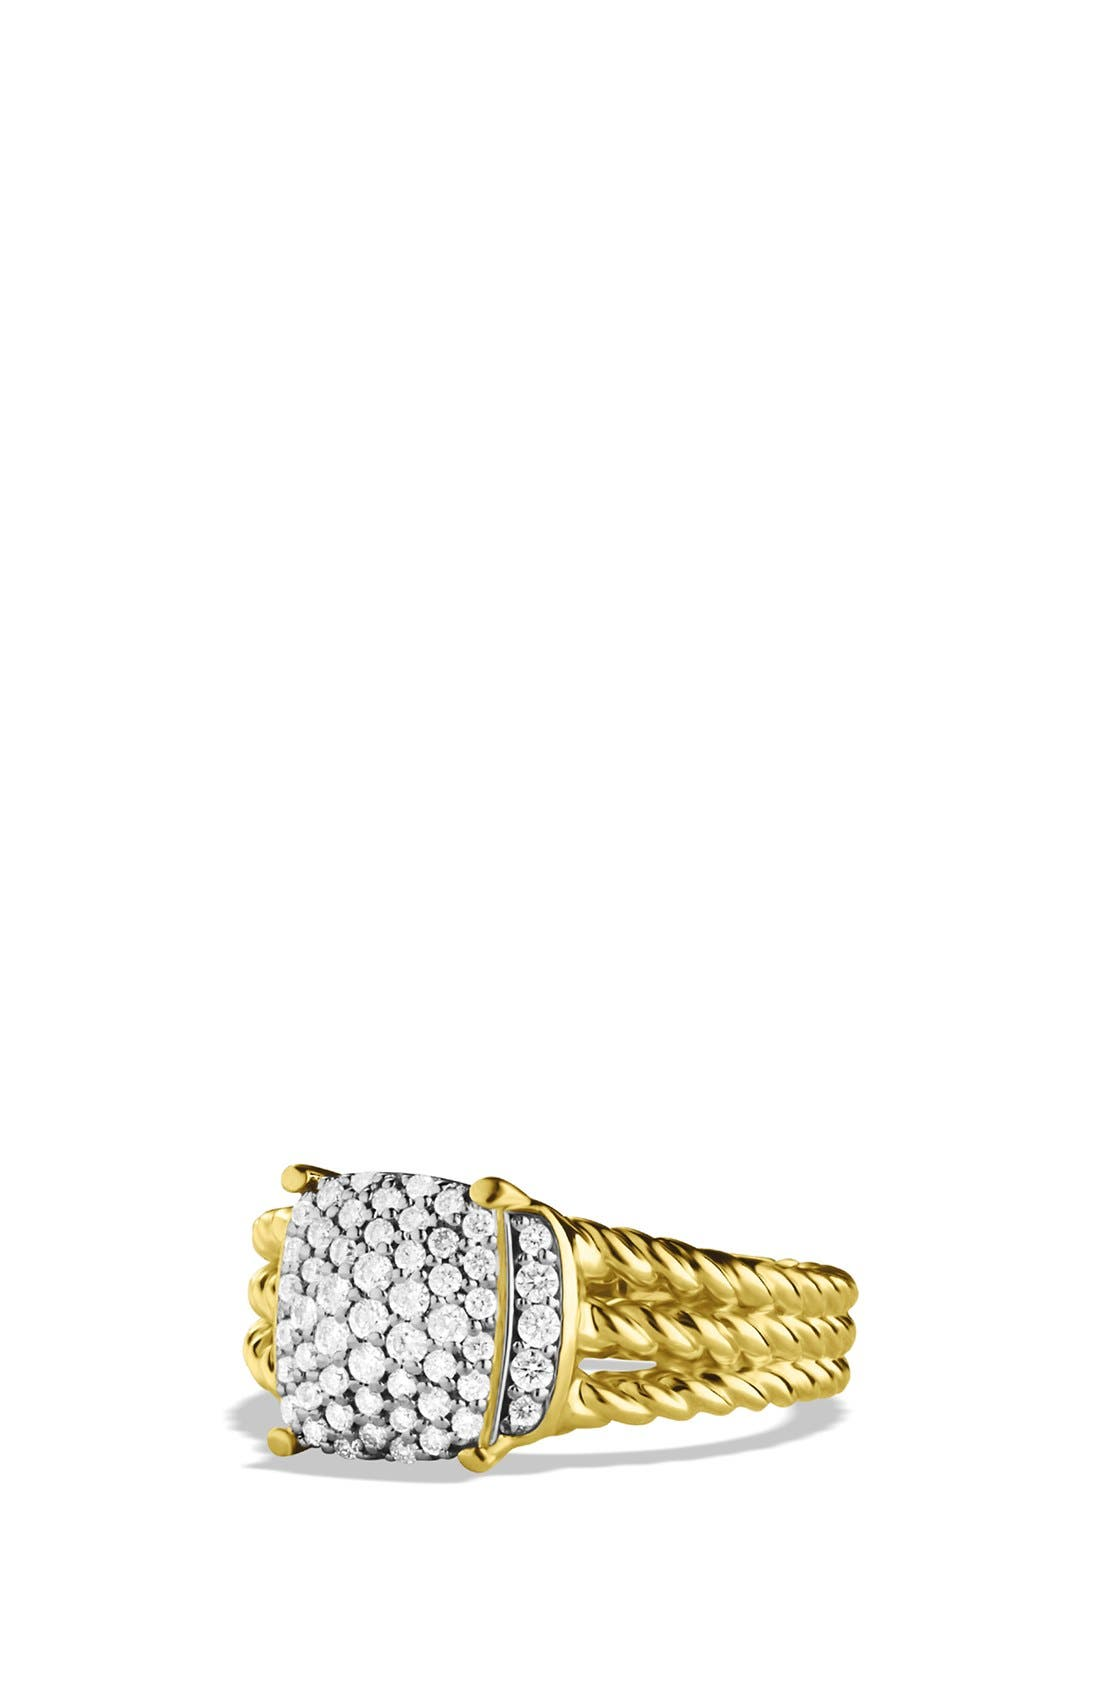 Alternate Image 1 Selected - David Yurman 'Wheaton' Petite Ring with Diamonds in Gold